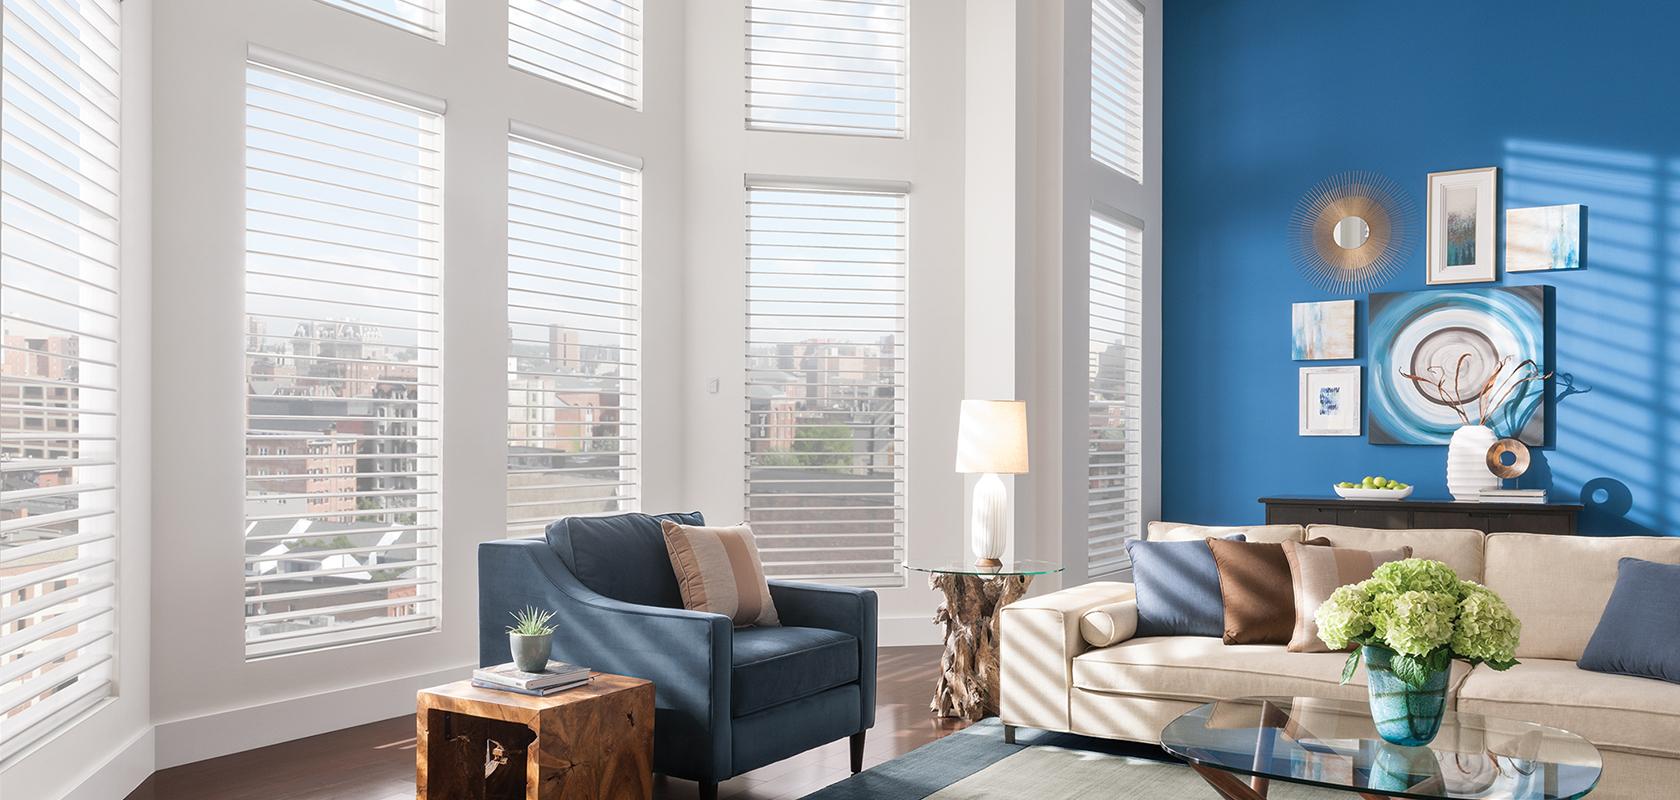 room scene window blinds